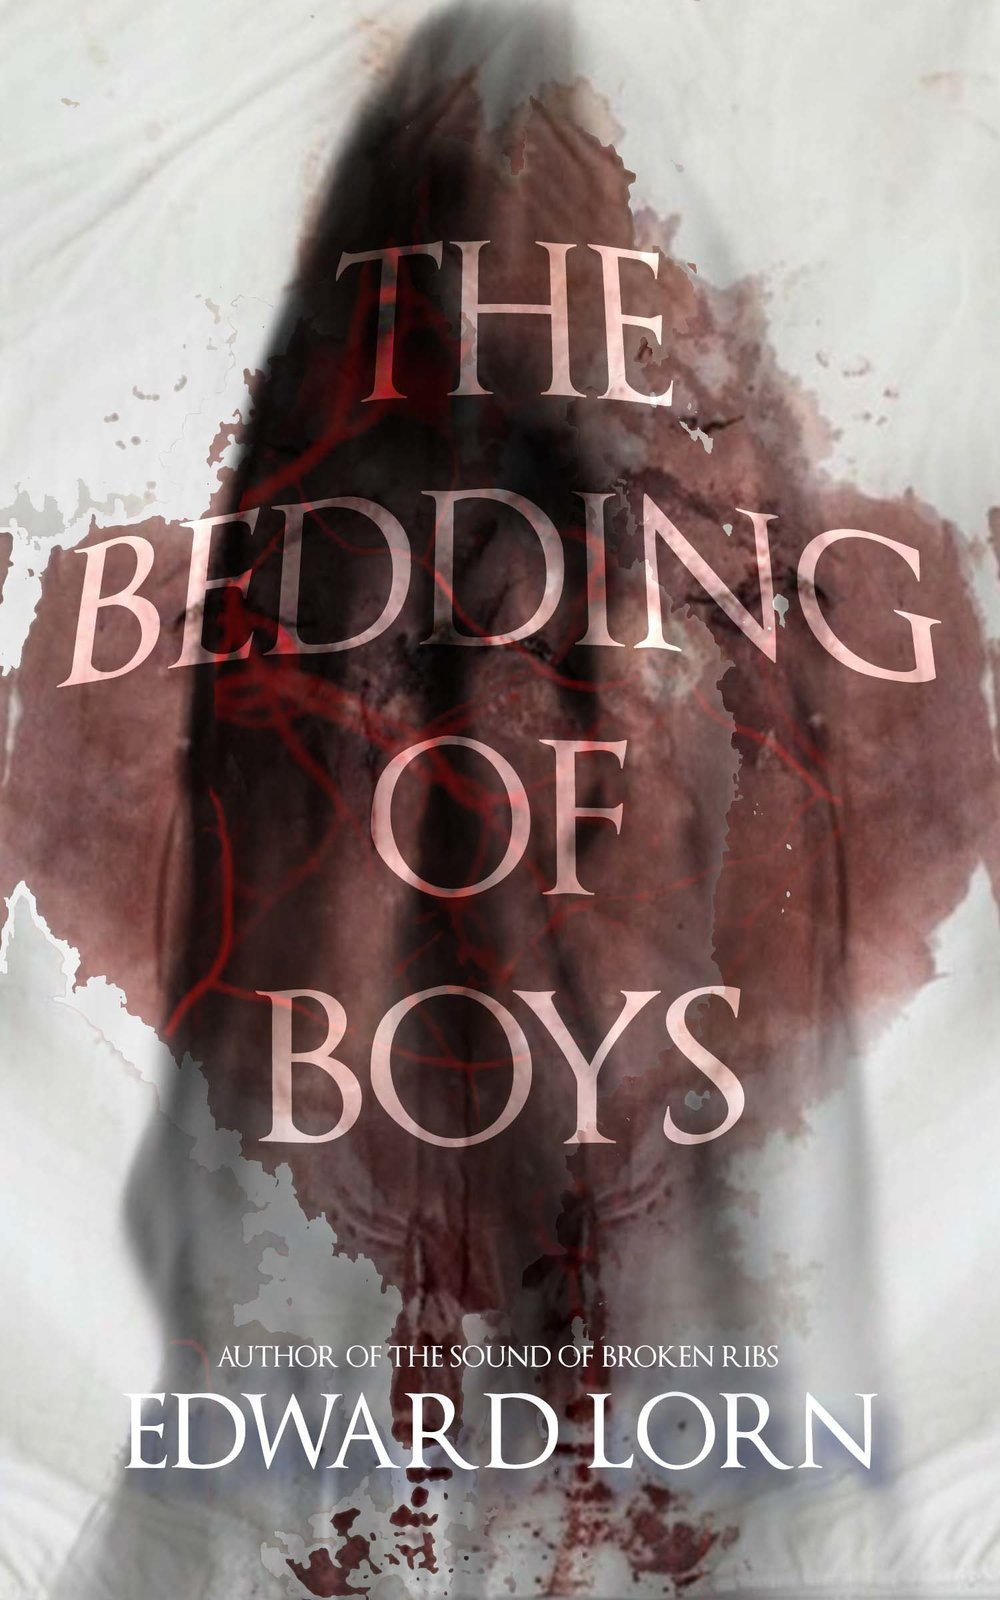 the-bedding-of-boys-edward-lorn.jpg